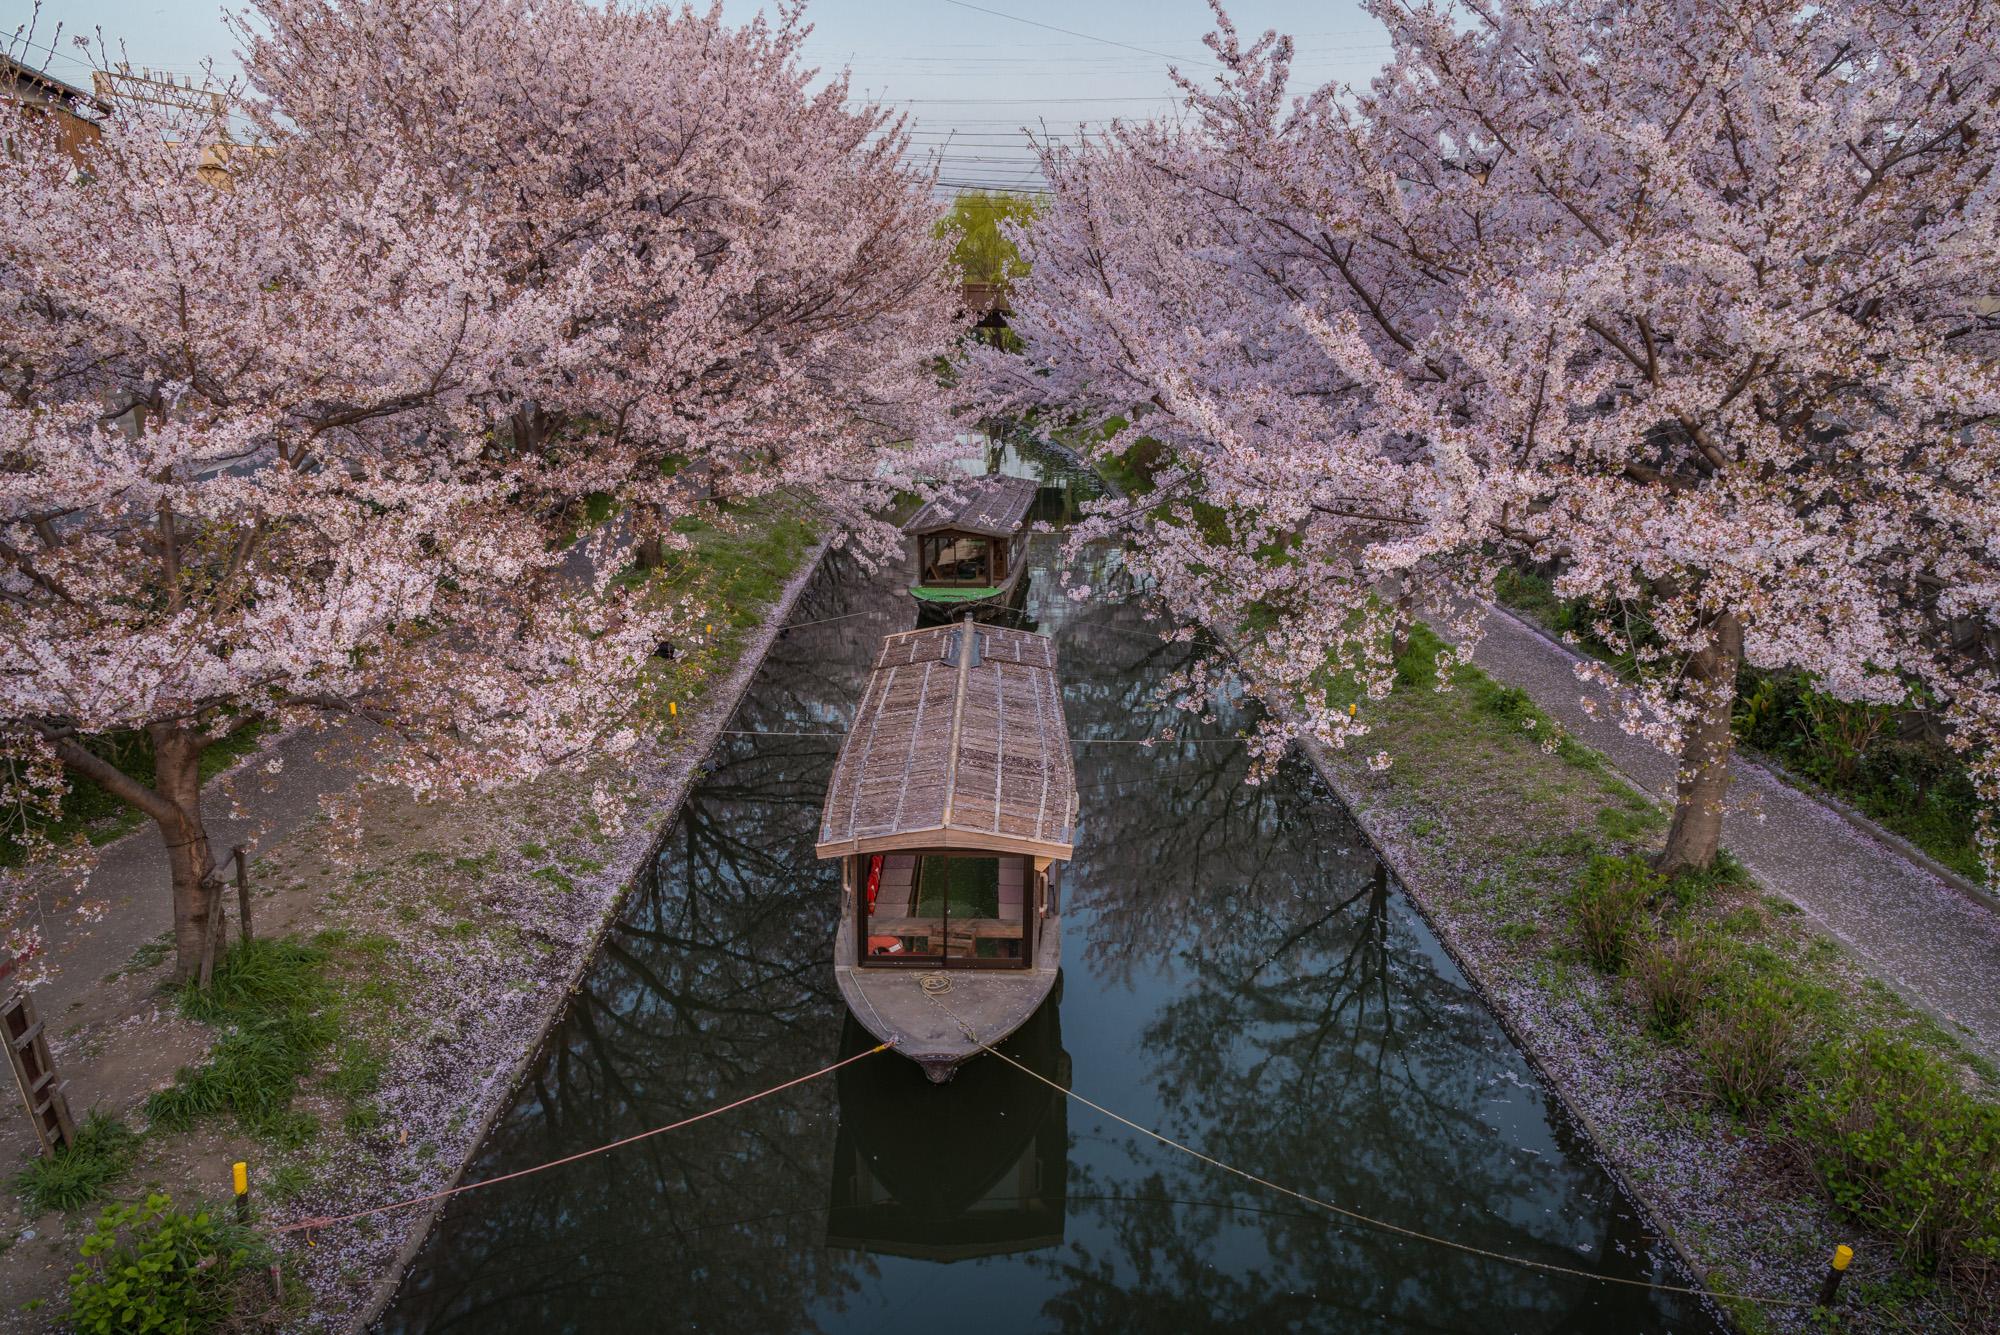 DSC_5580 京都府 中書島 伏見十石舟(桜と船の風情を感じる美しい景色!京都の春におすすめ桜写真スポット! 撮影した写真の紹介、アクセス情報など)